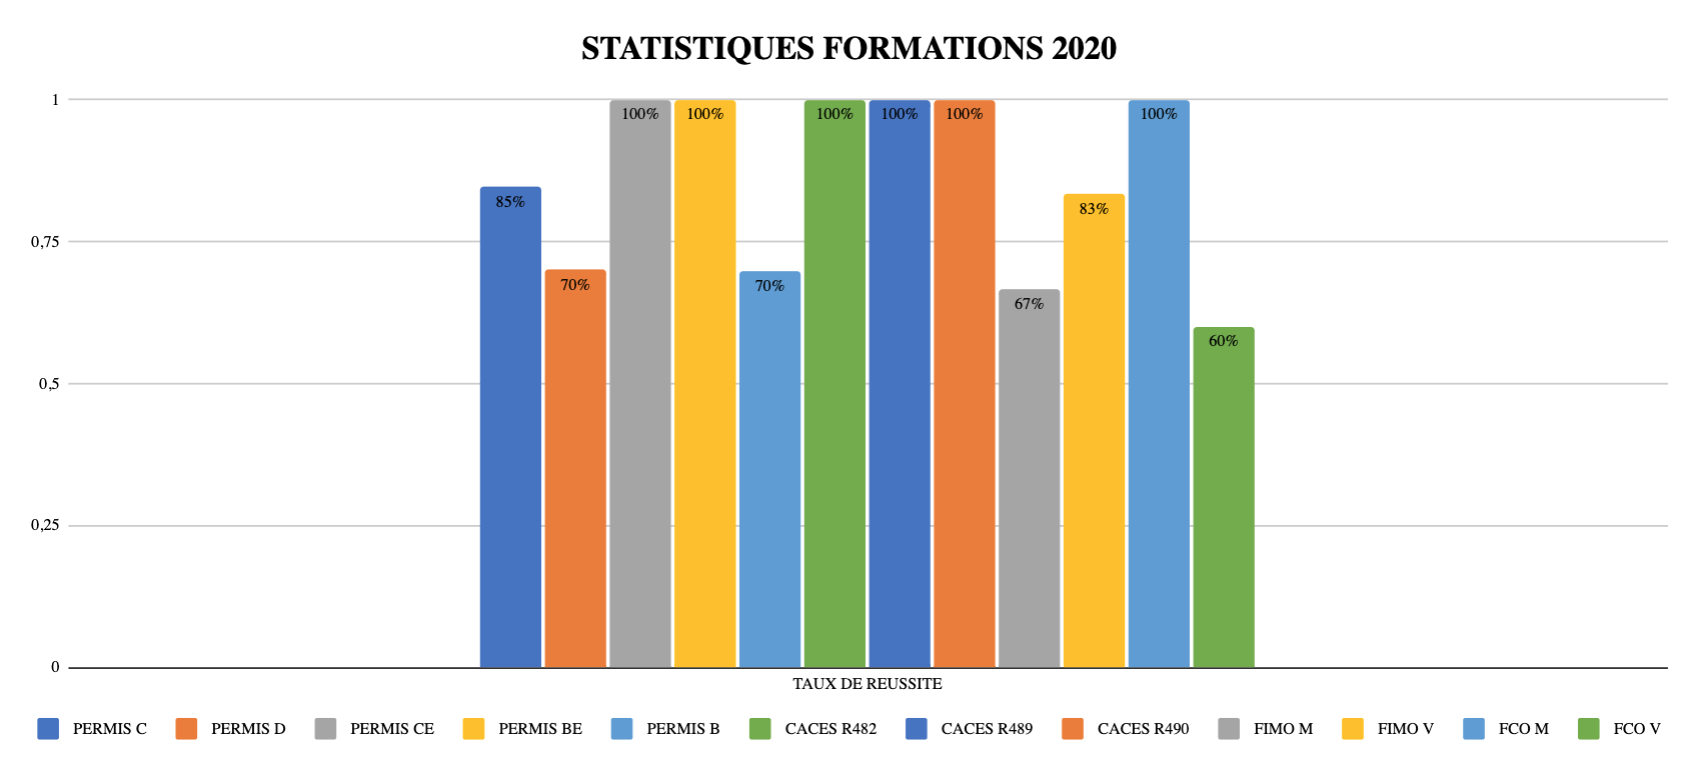 Statistiques RAMASSAMY FORMATION 2020 2021